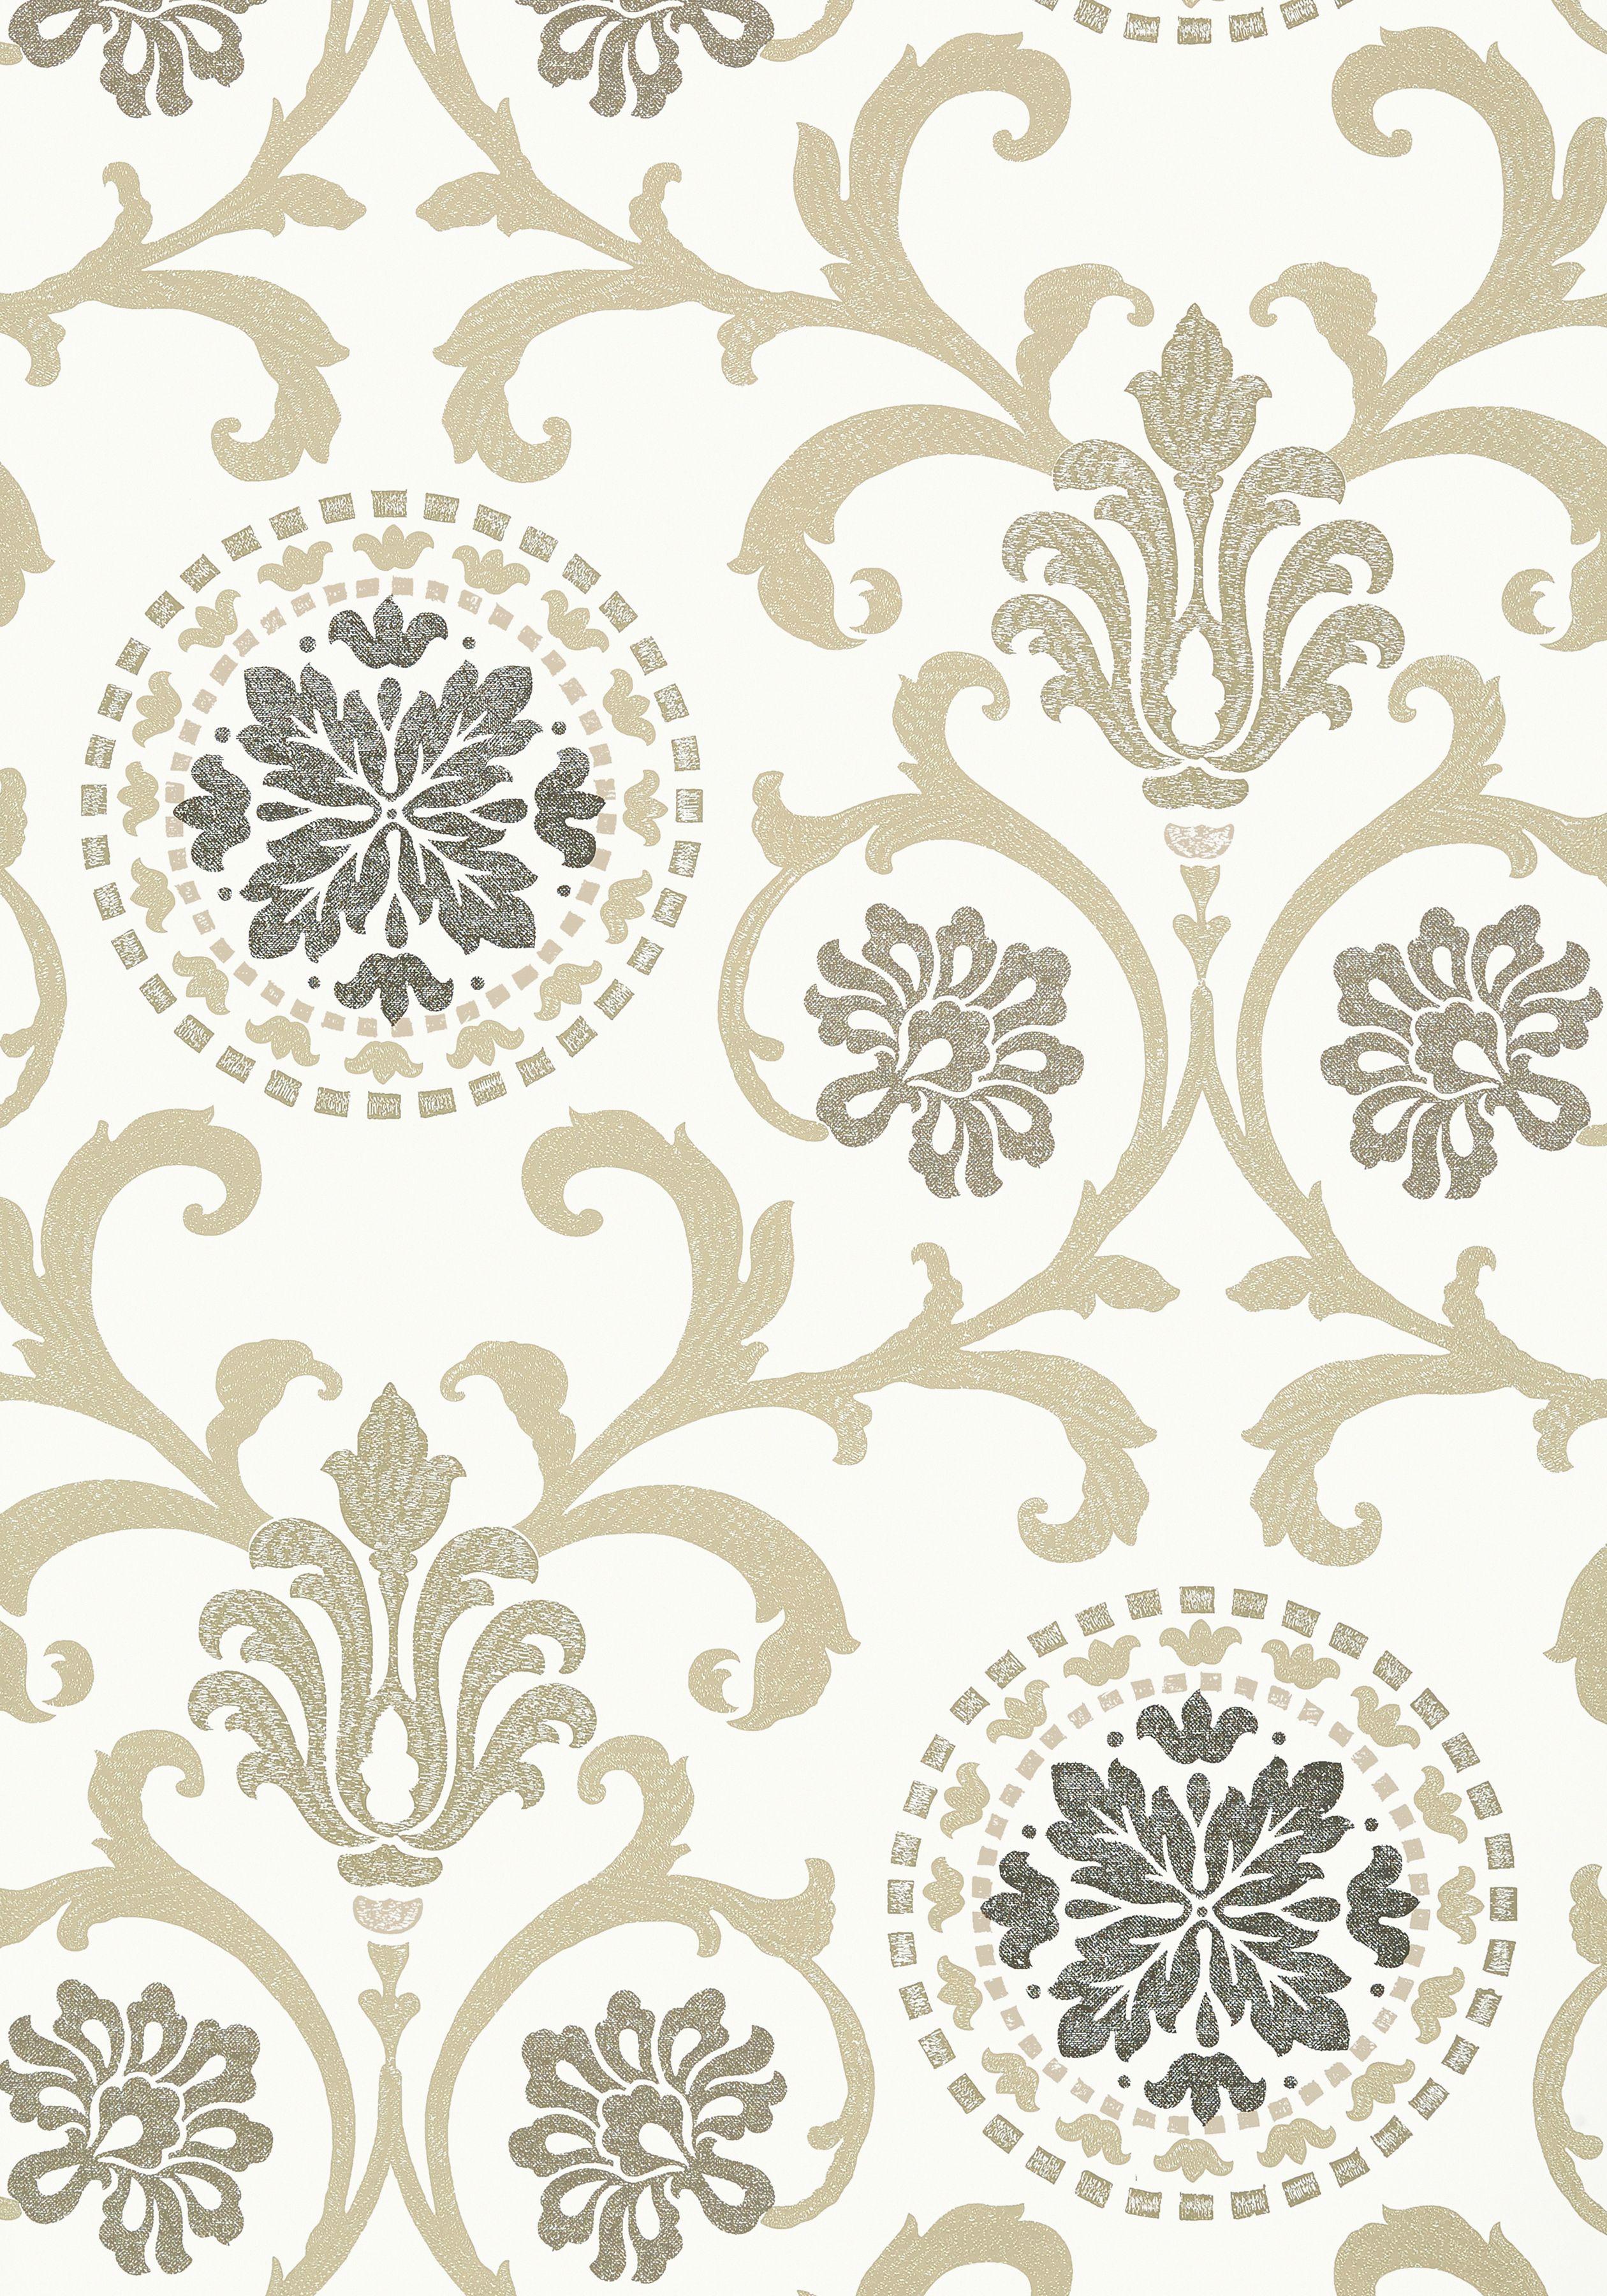 T64101 Kitchen Wallpaper Patterns Thibaut Wallpaper Neutral